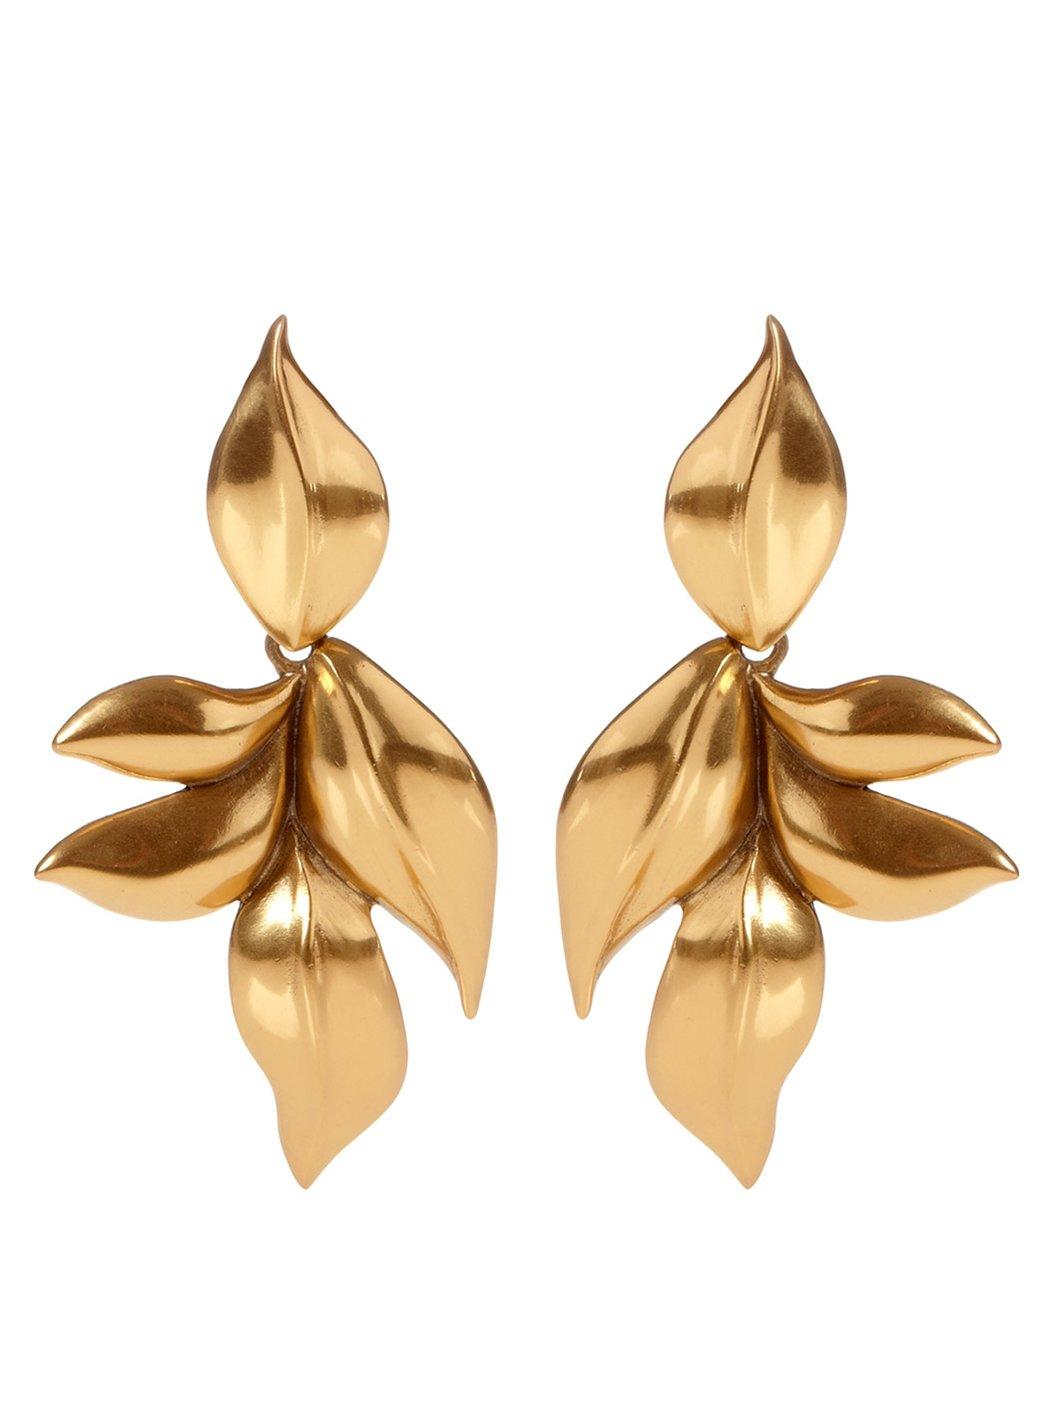 Oscar De La Renta Gold-plated Clip Earrings Ed6iUhrV